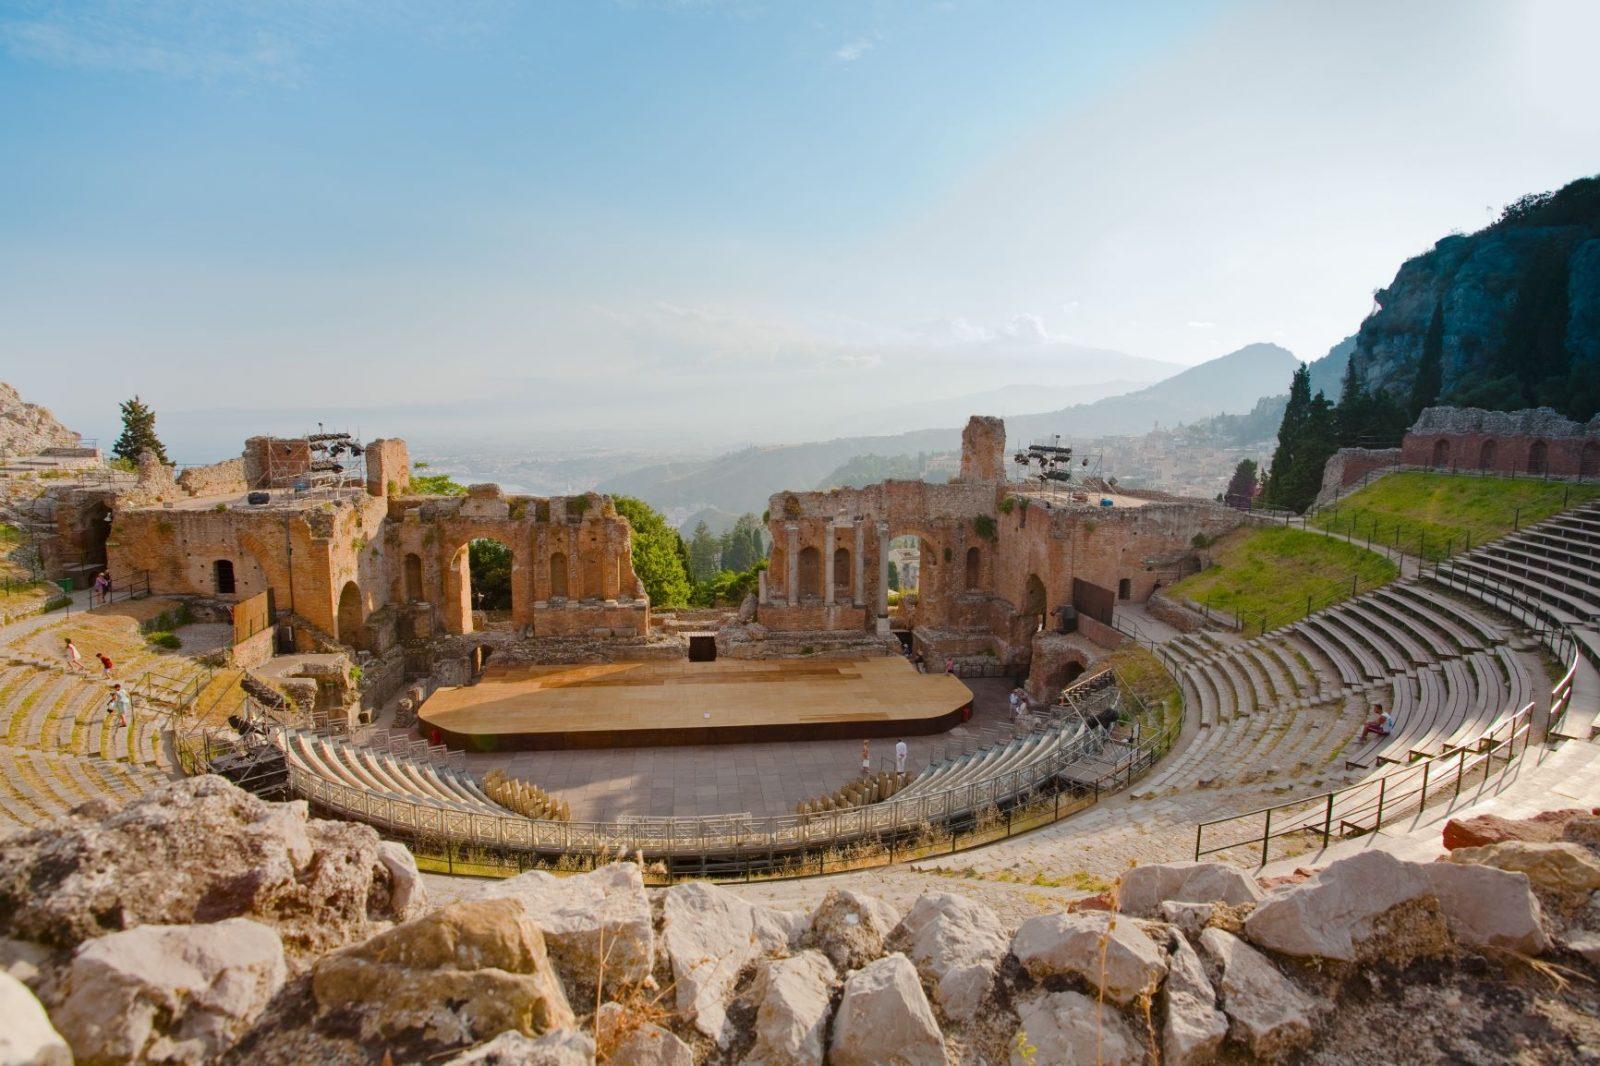 Les om Teatro Creco Sicilia i koffertogkamera bloggen